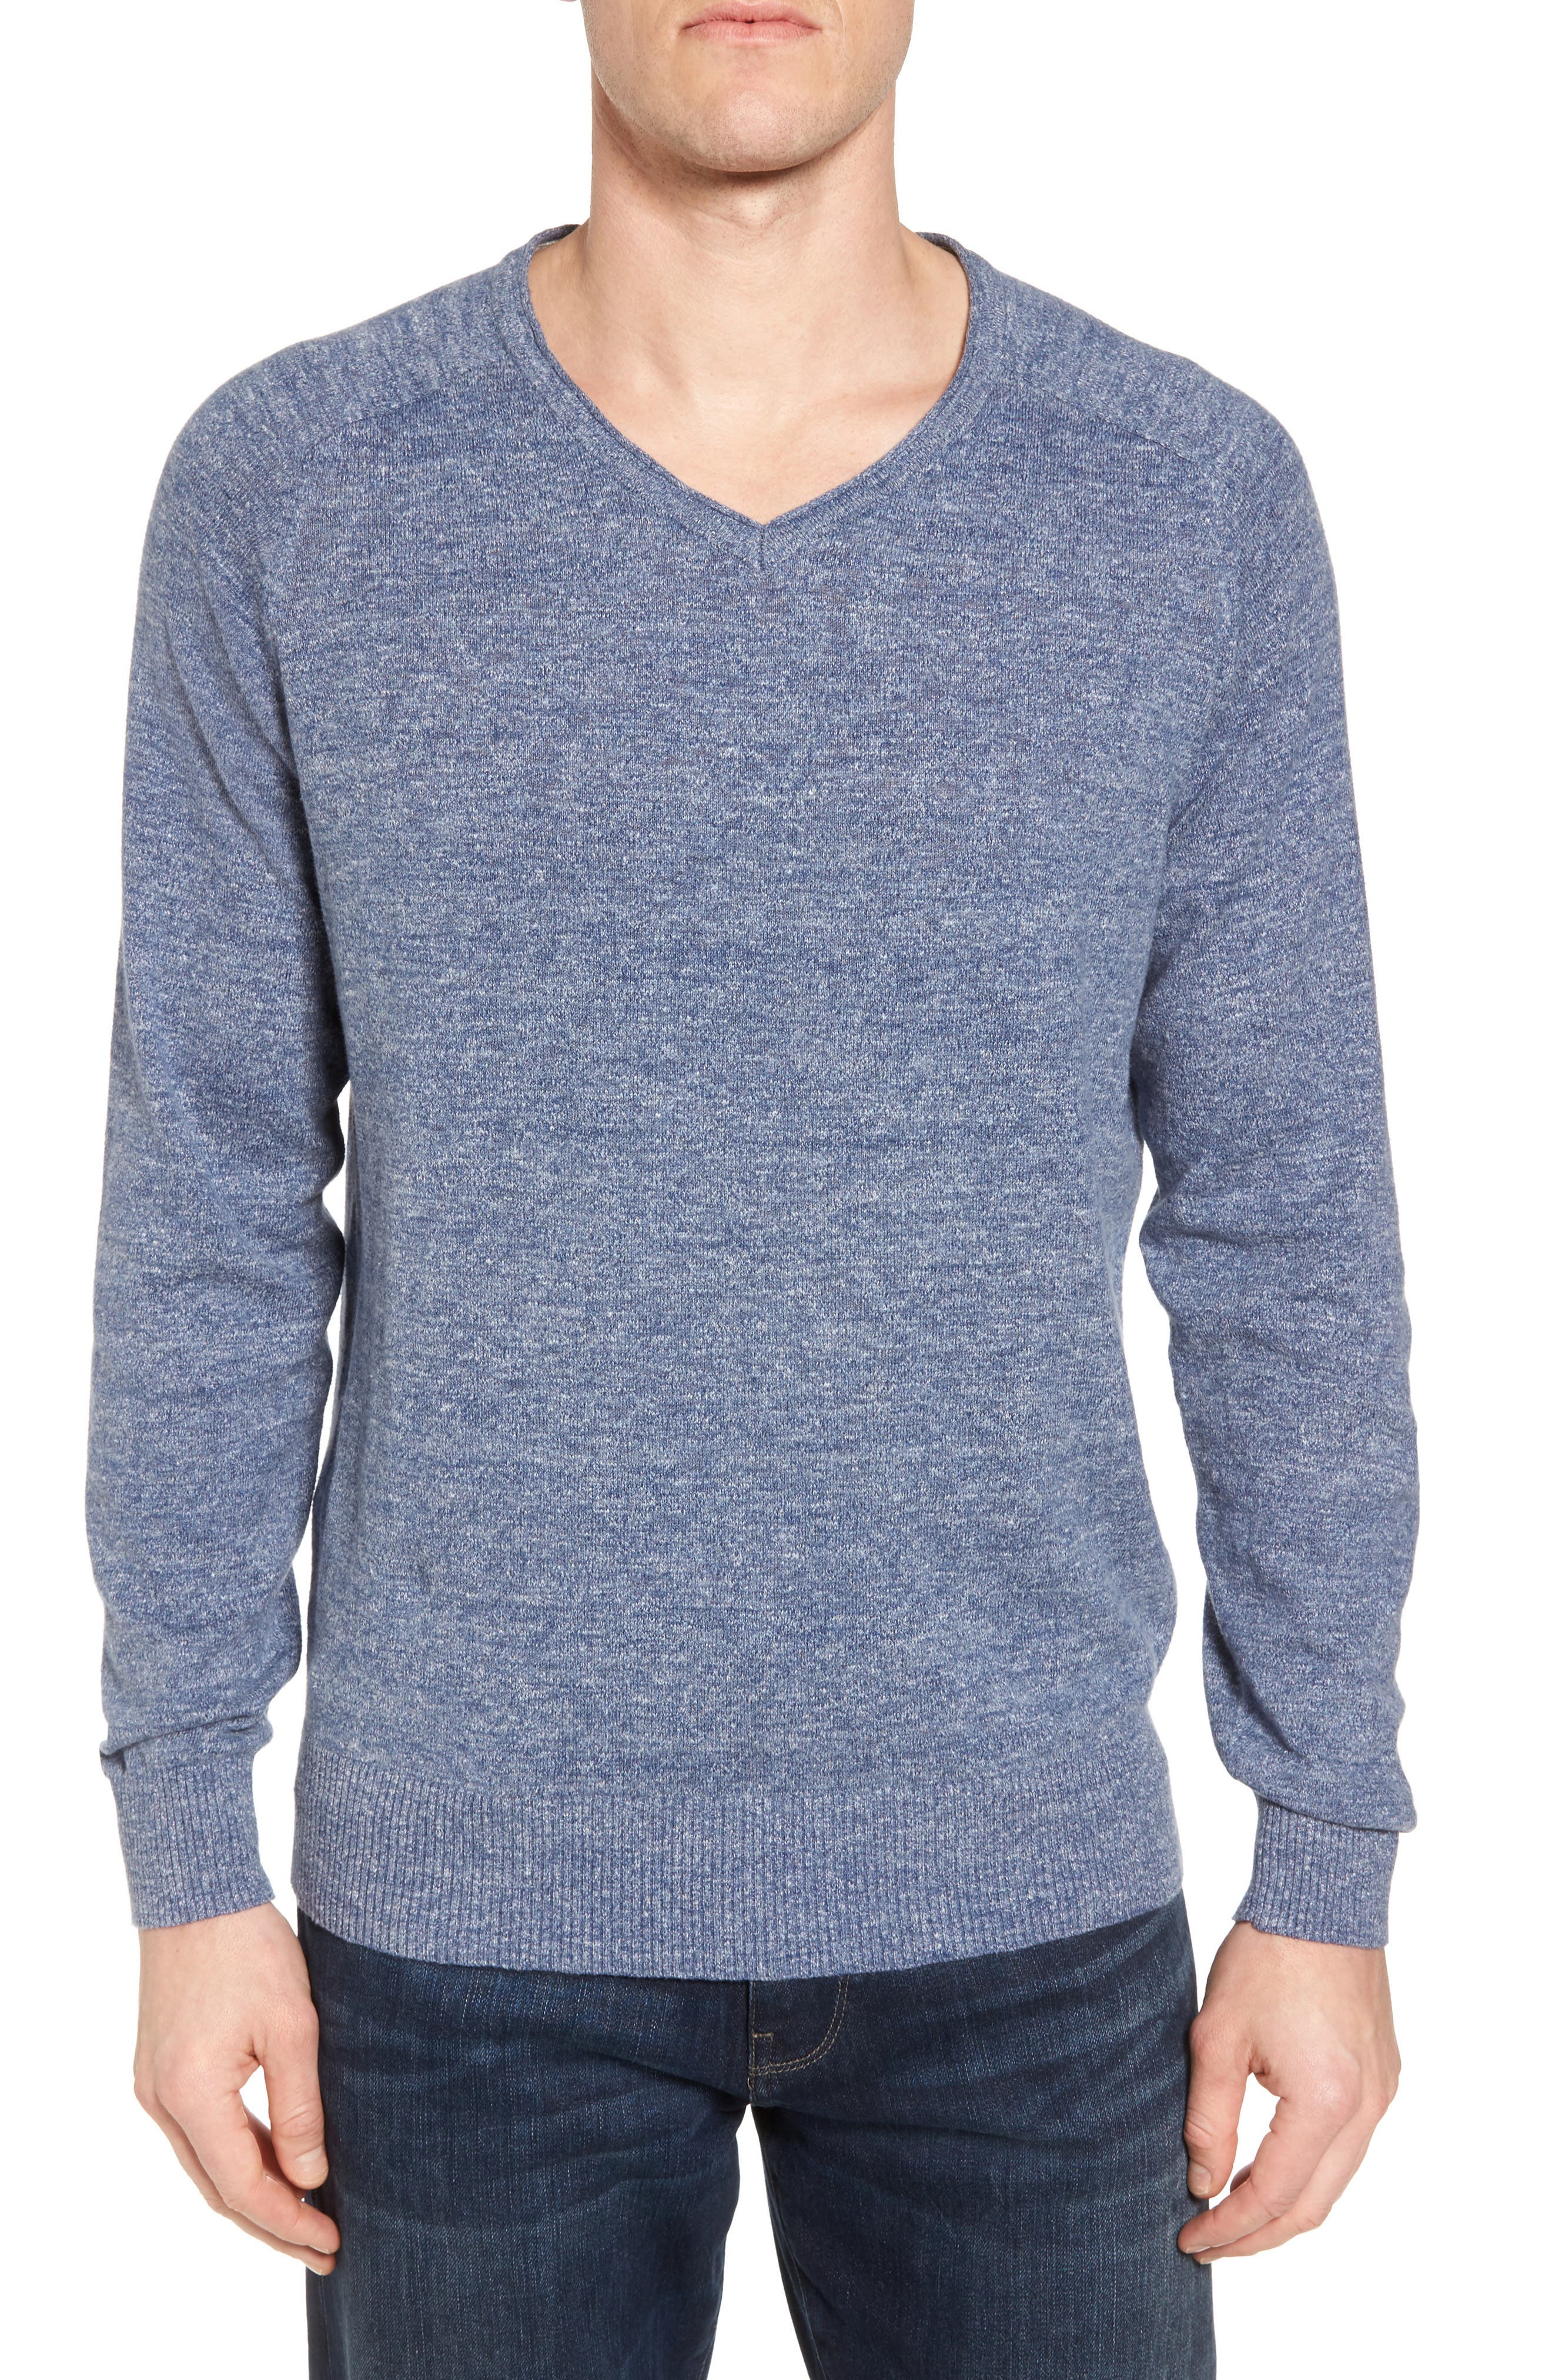 Main Image - Rodd & Gunn Arbors Cotton V-Neck Sweater